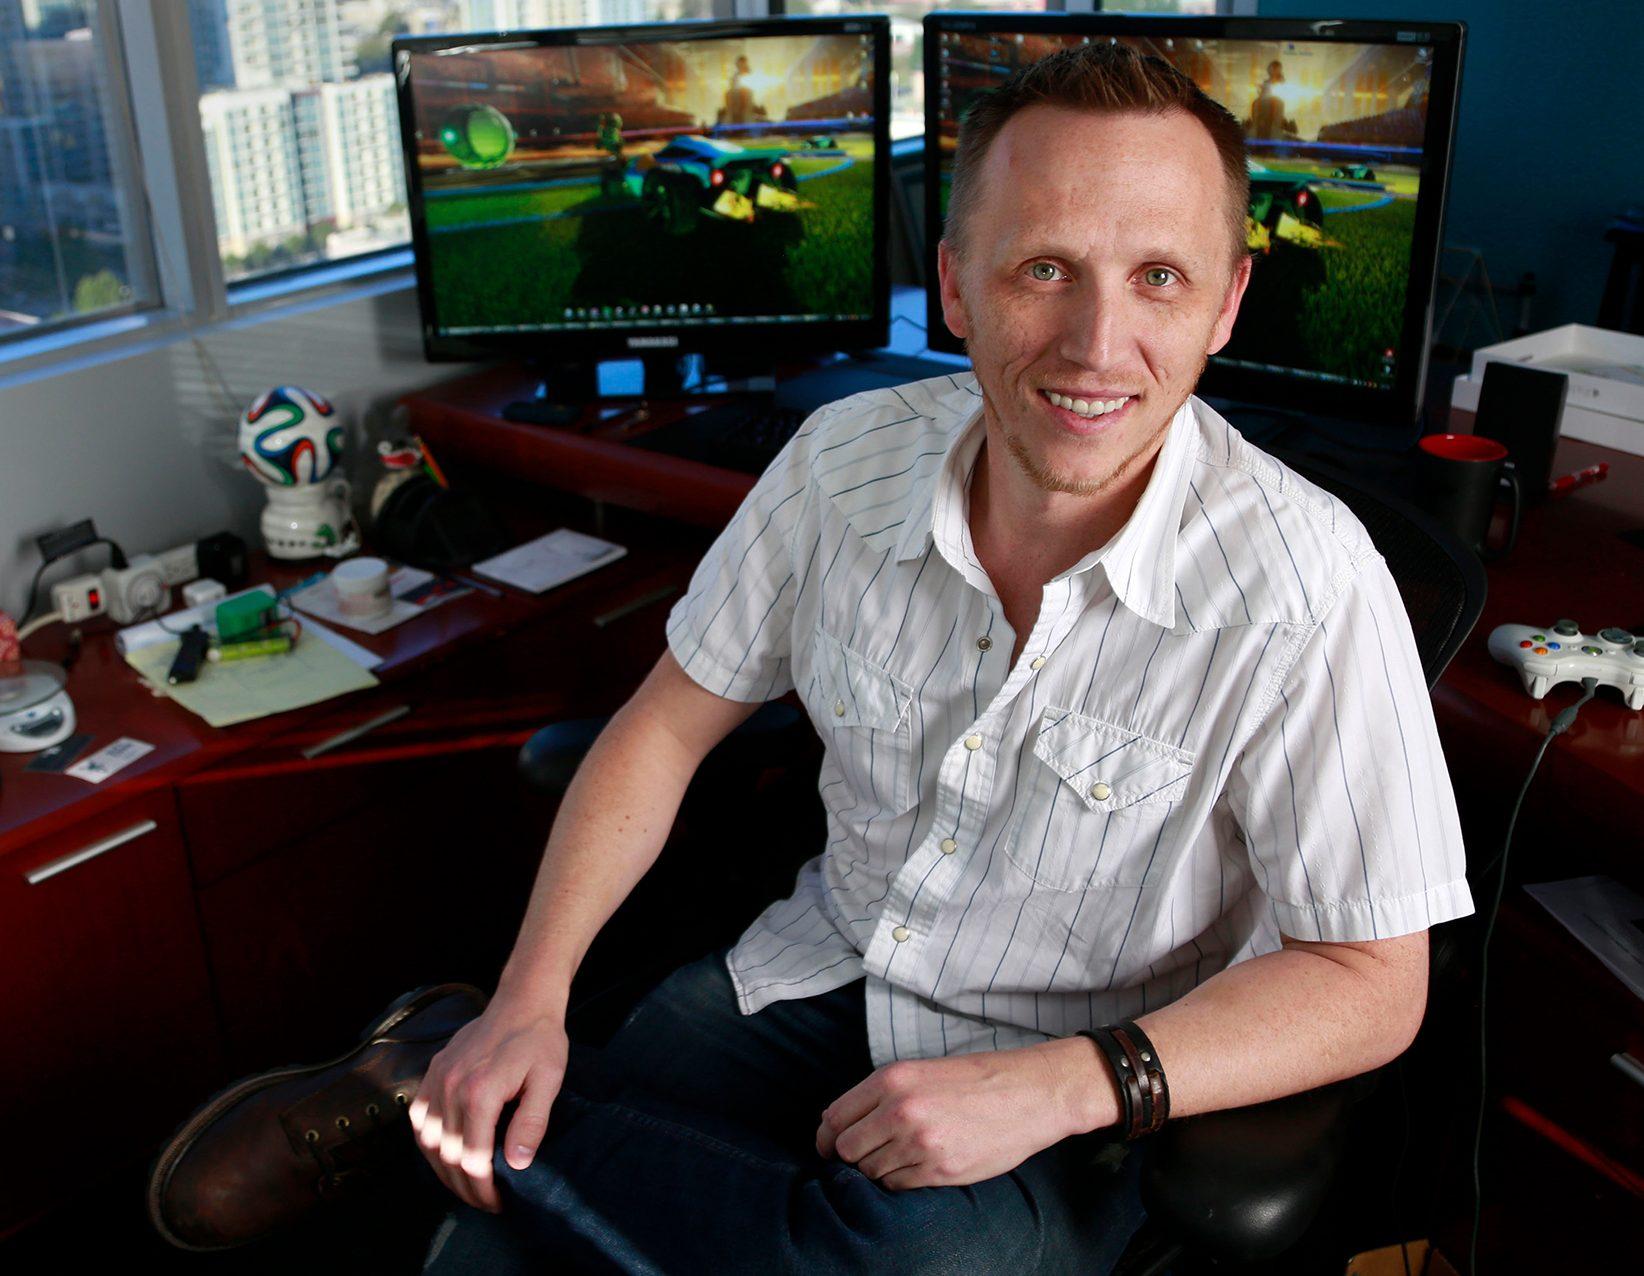 David. F. Hagewood Rocket League CEO